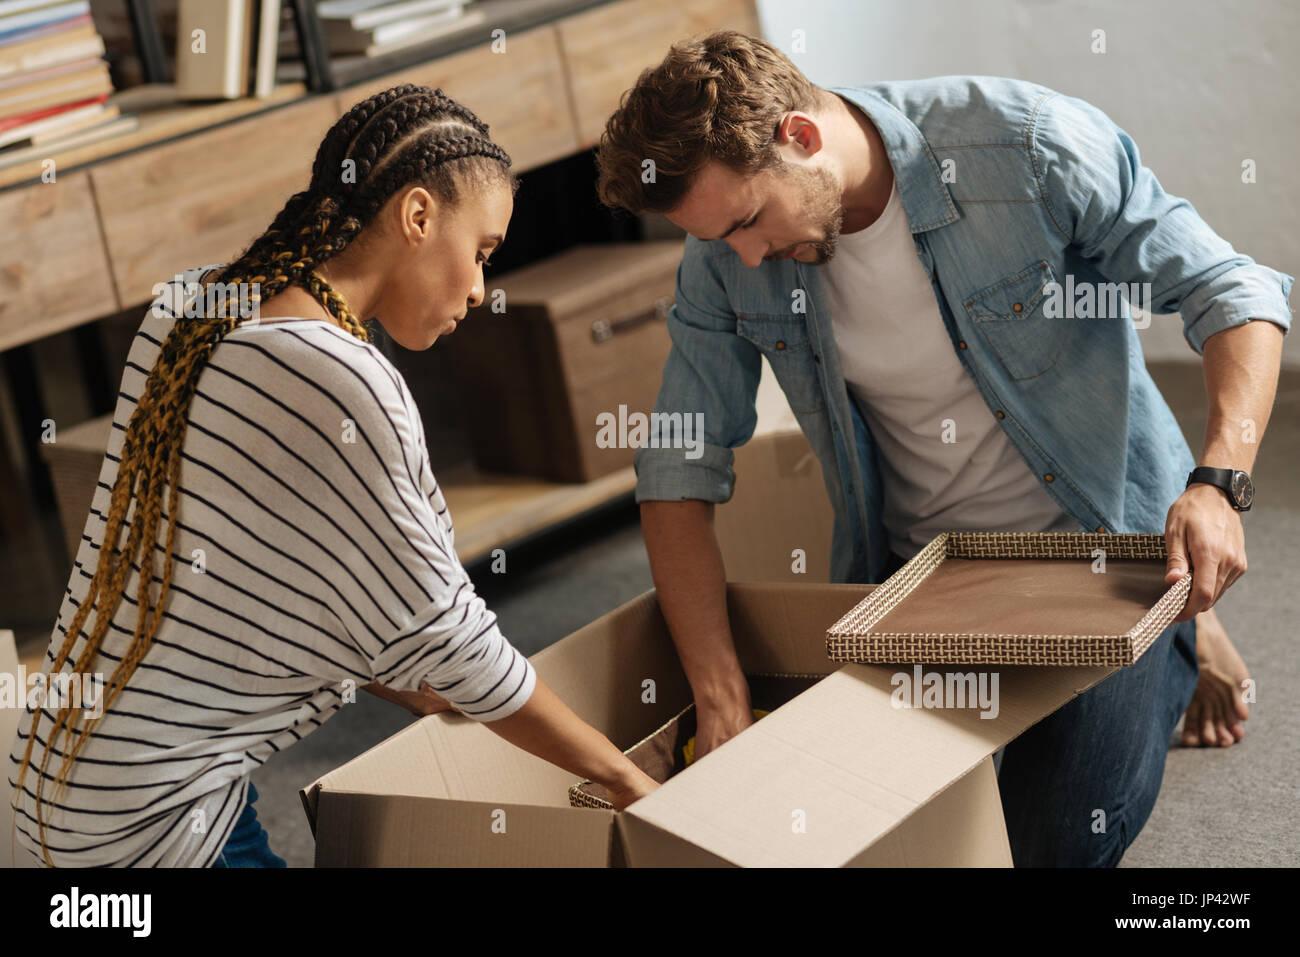 Aufmerksame Partner Verbeugung Köpfe beim Blick nach unten Stockbild